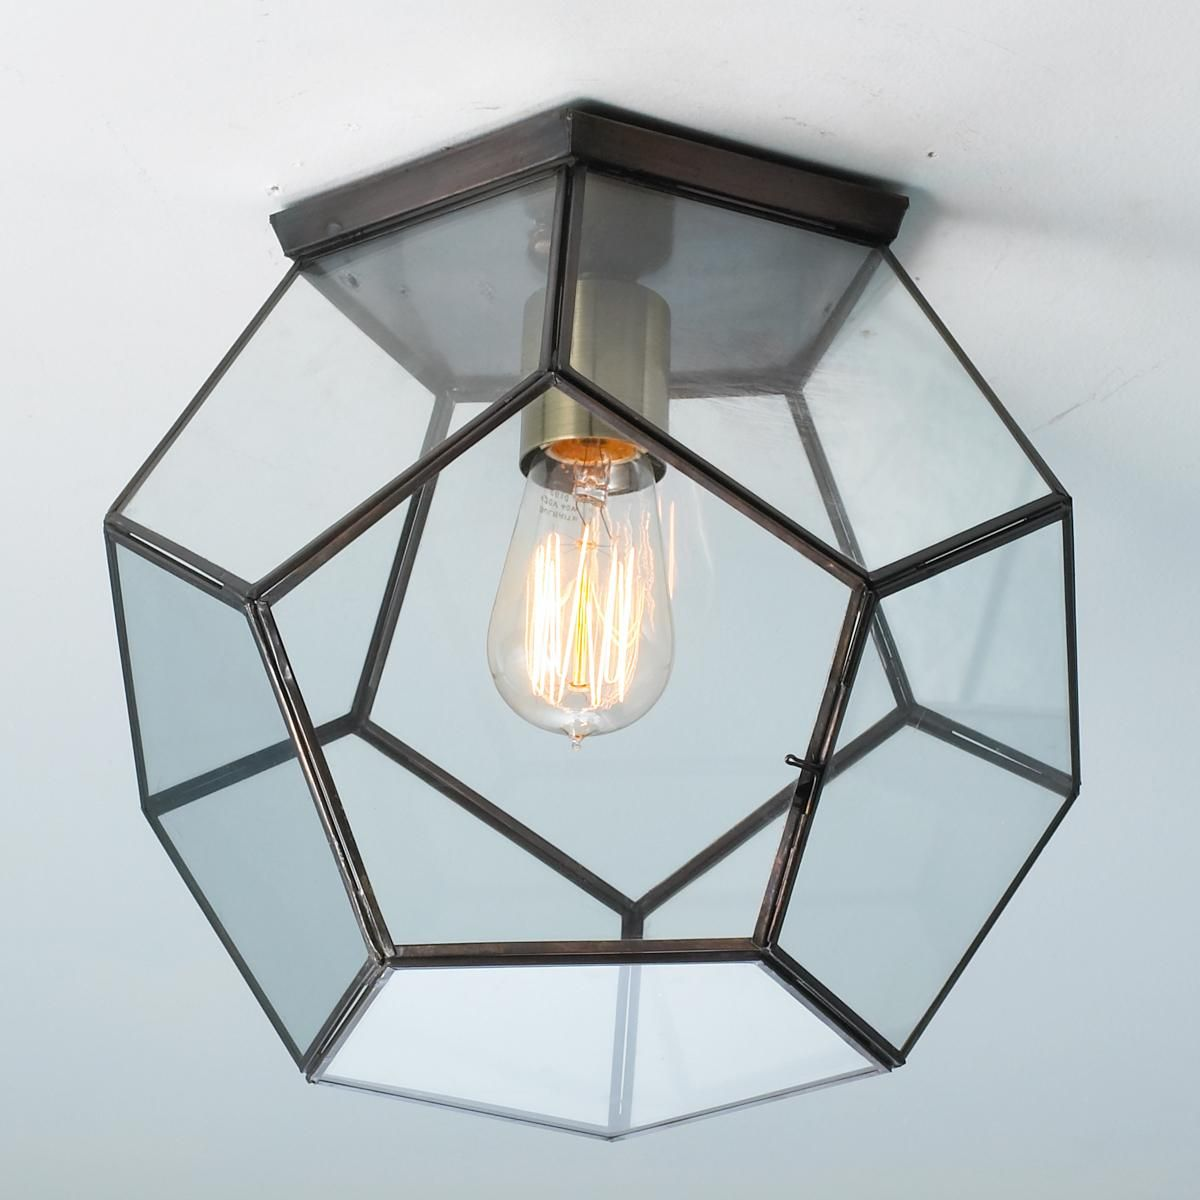 Clear Glass Prism Pentagon Ceiling Light